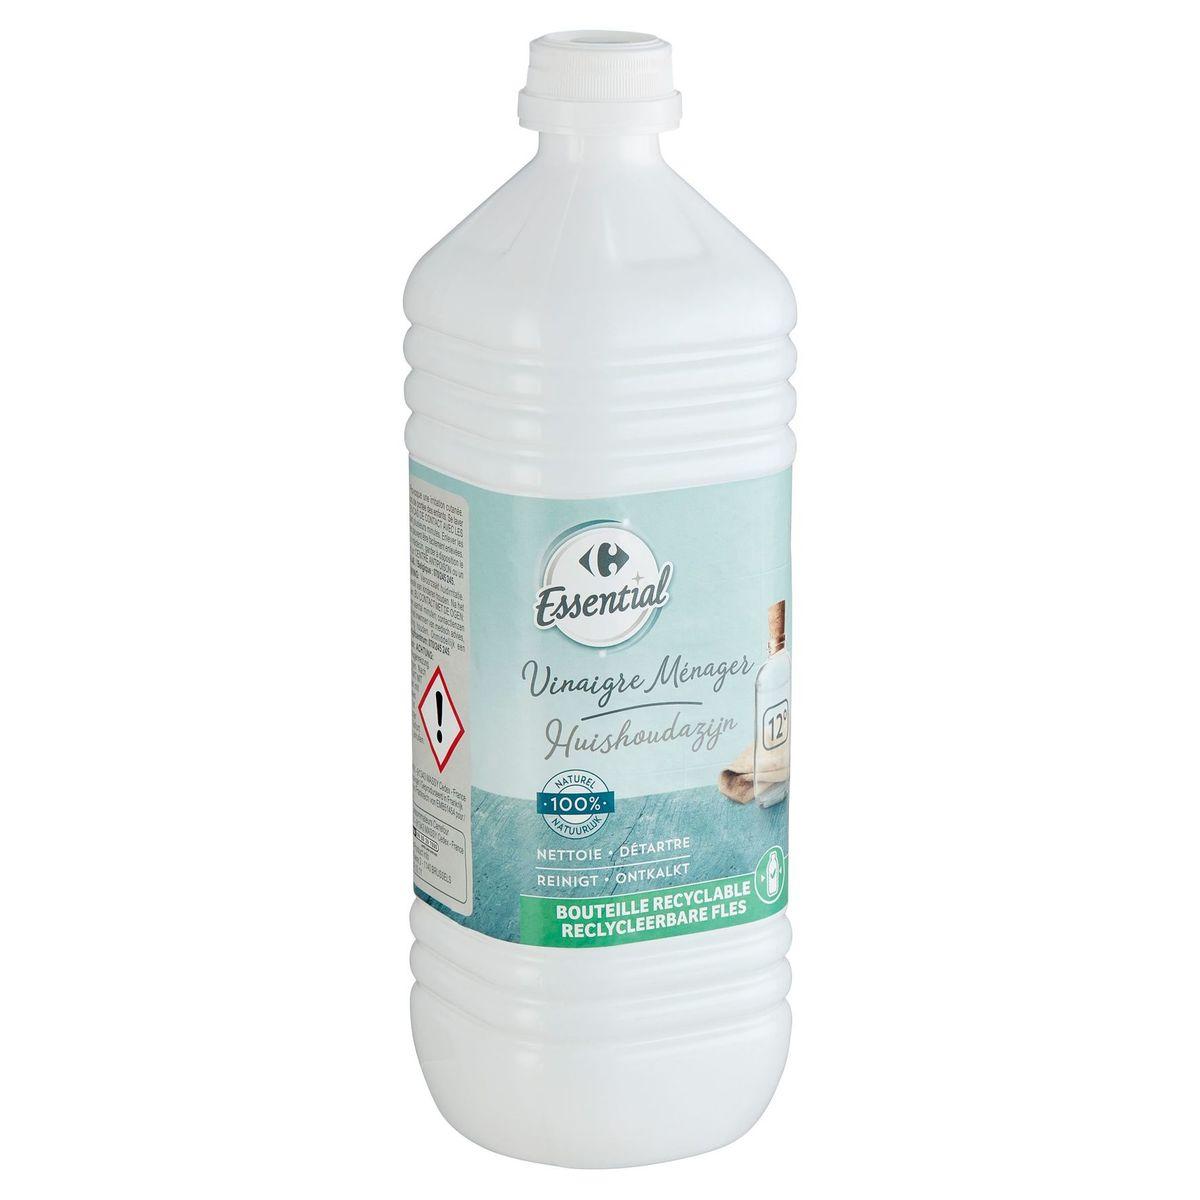 Carrefour Essential Huishoudazijn 12° 1 L